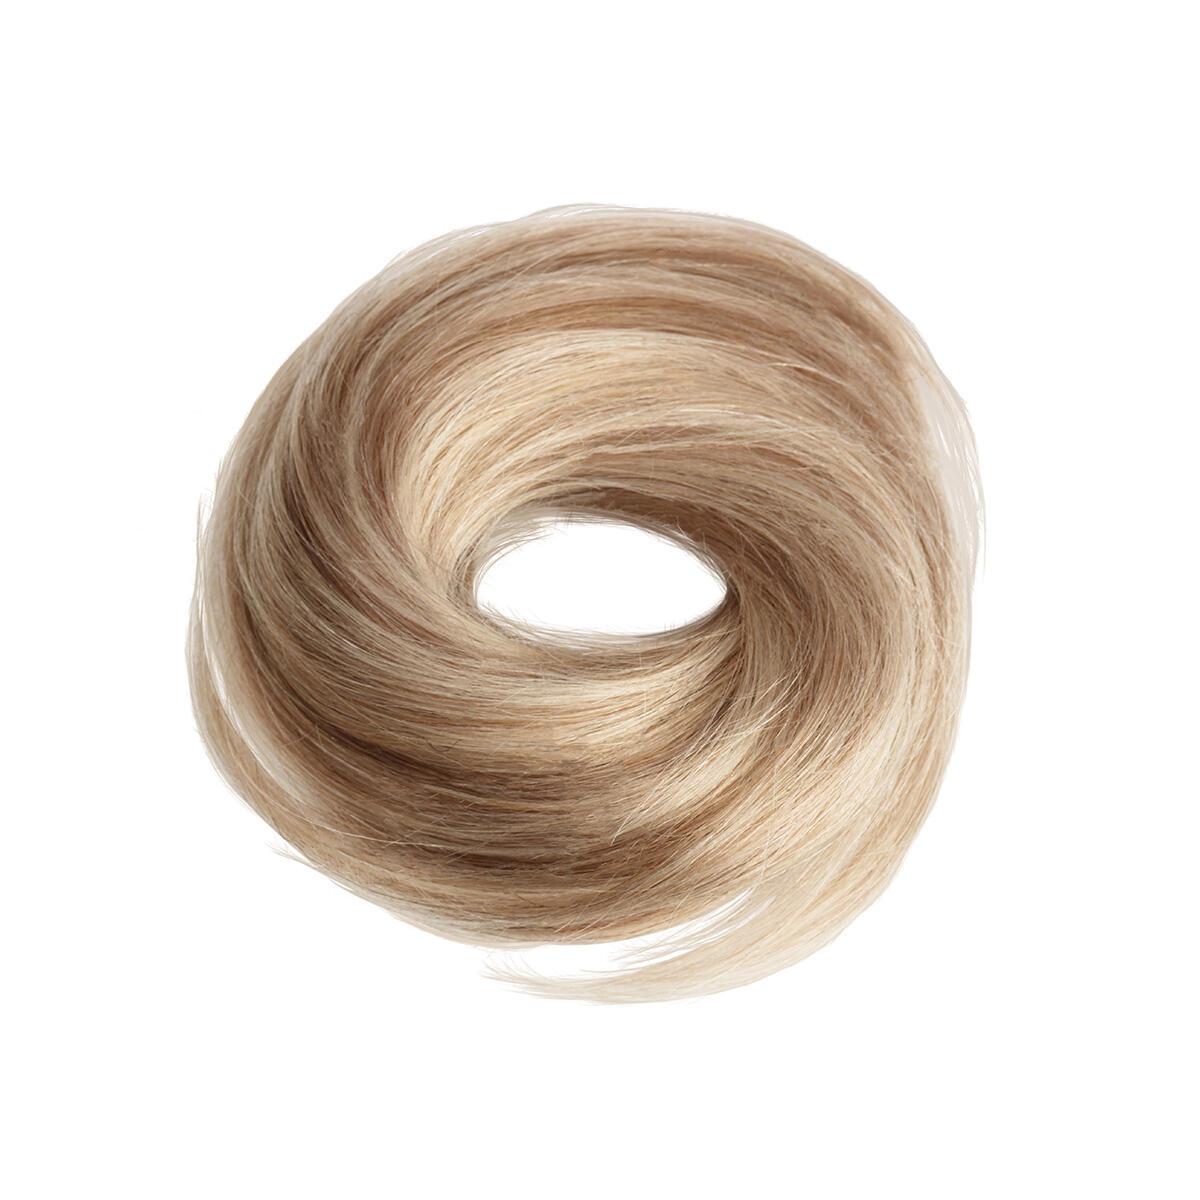 Volume Hair Scrunchie M7.1/10.8 Natural Ash Blonde Mix